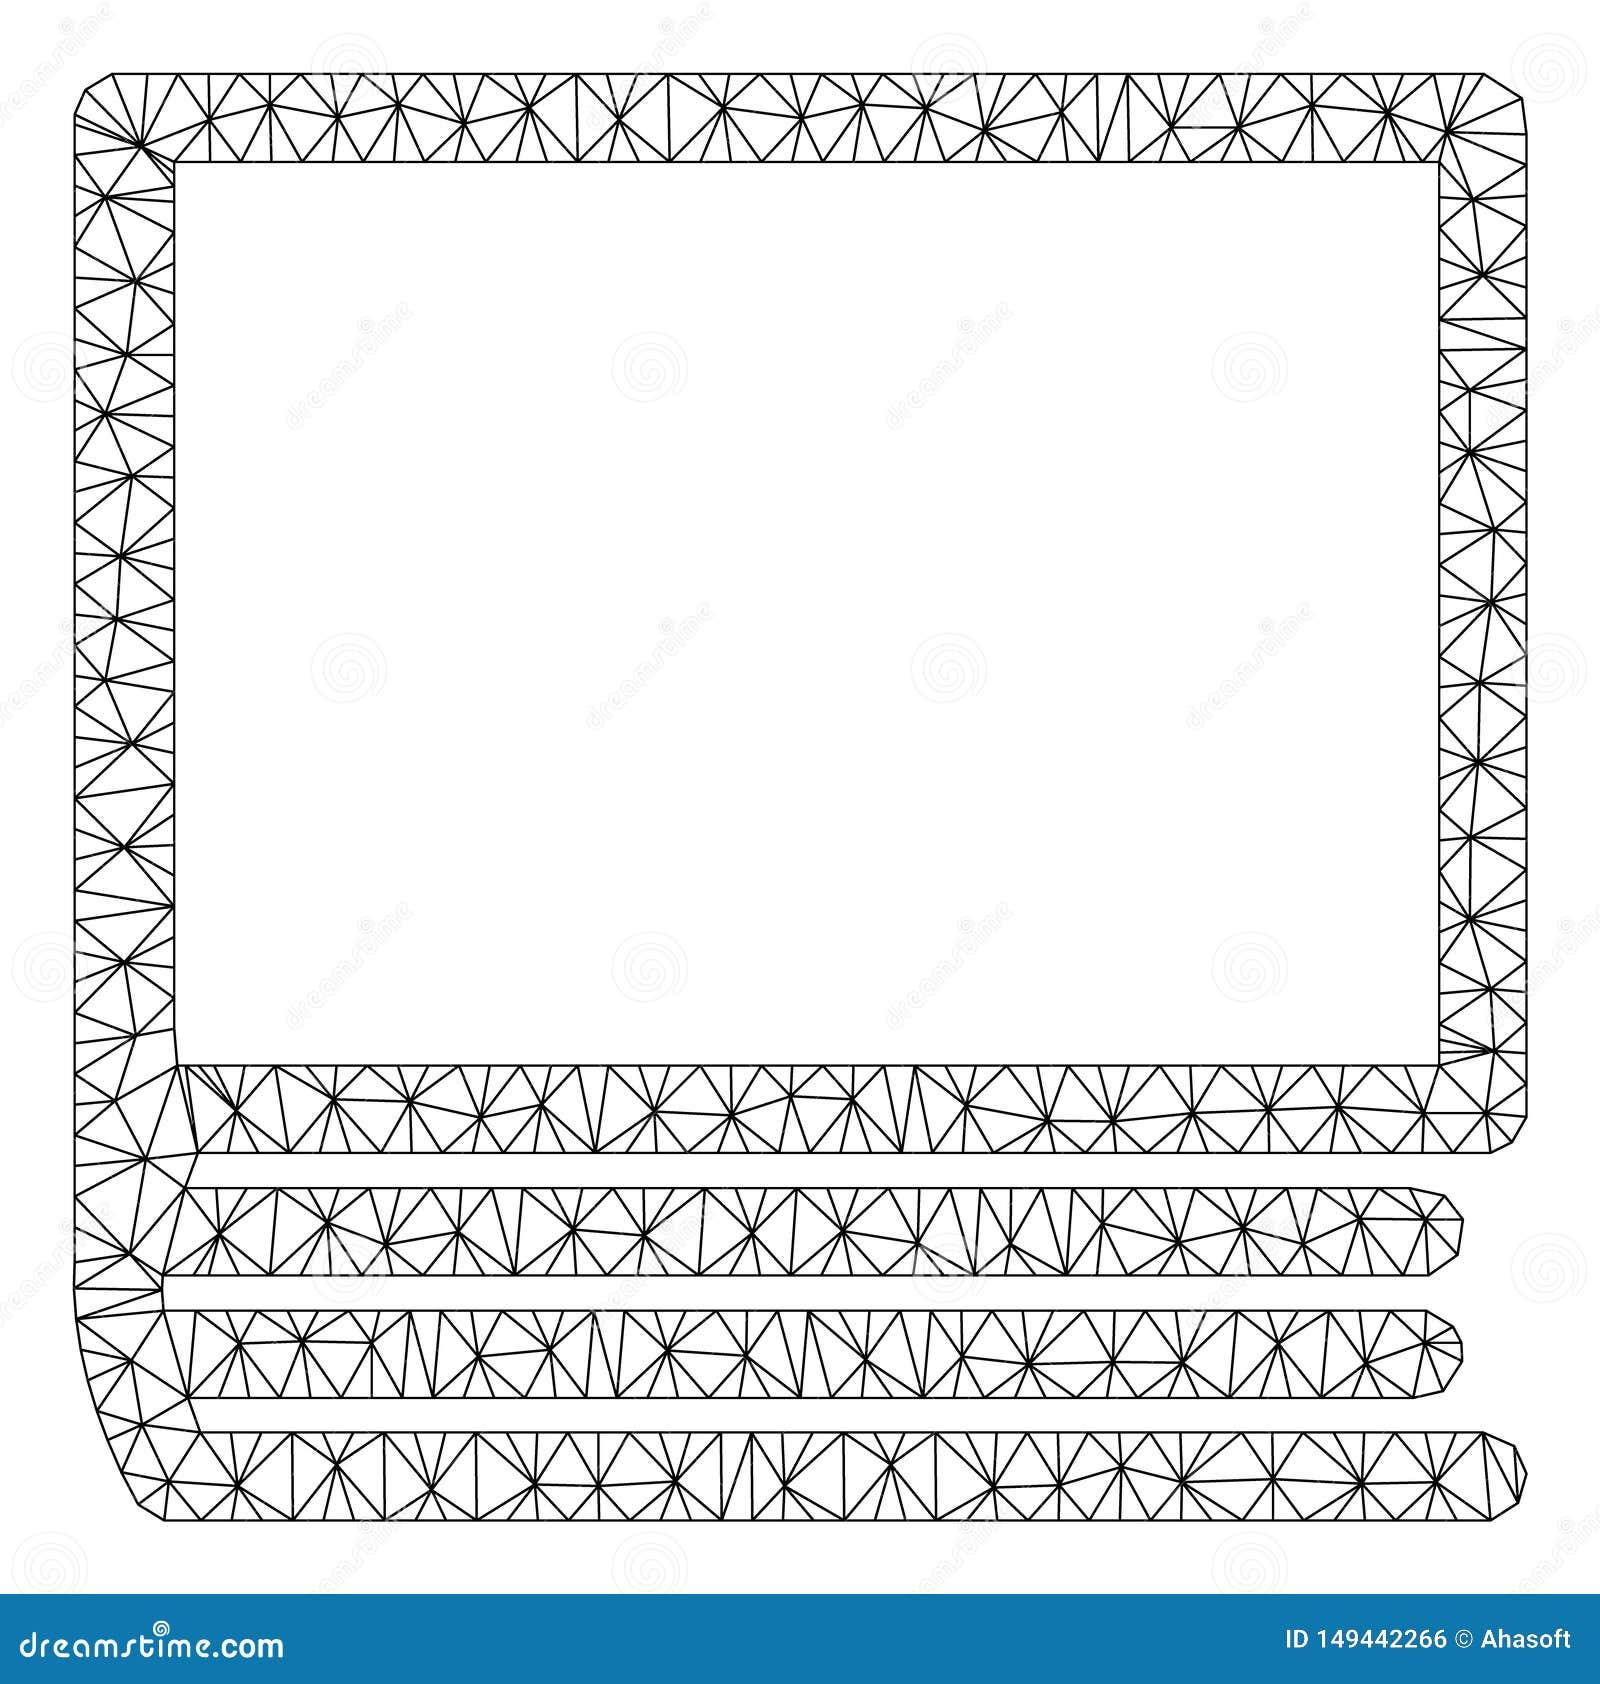 Buch-polygonaler Rahmen-Vektor Mesh Illustration